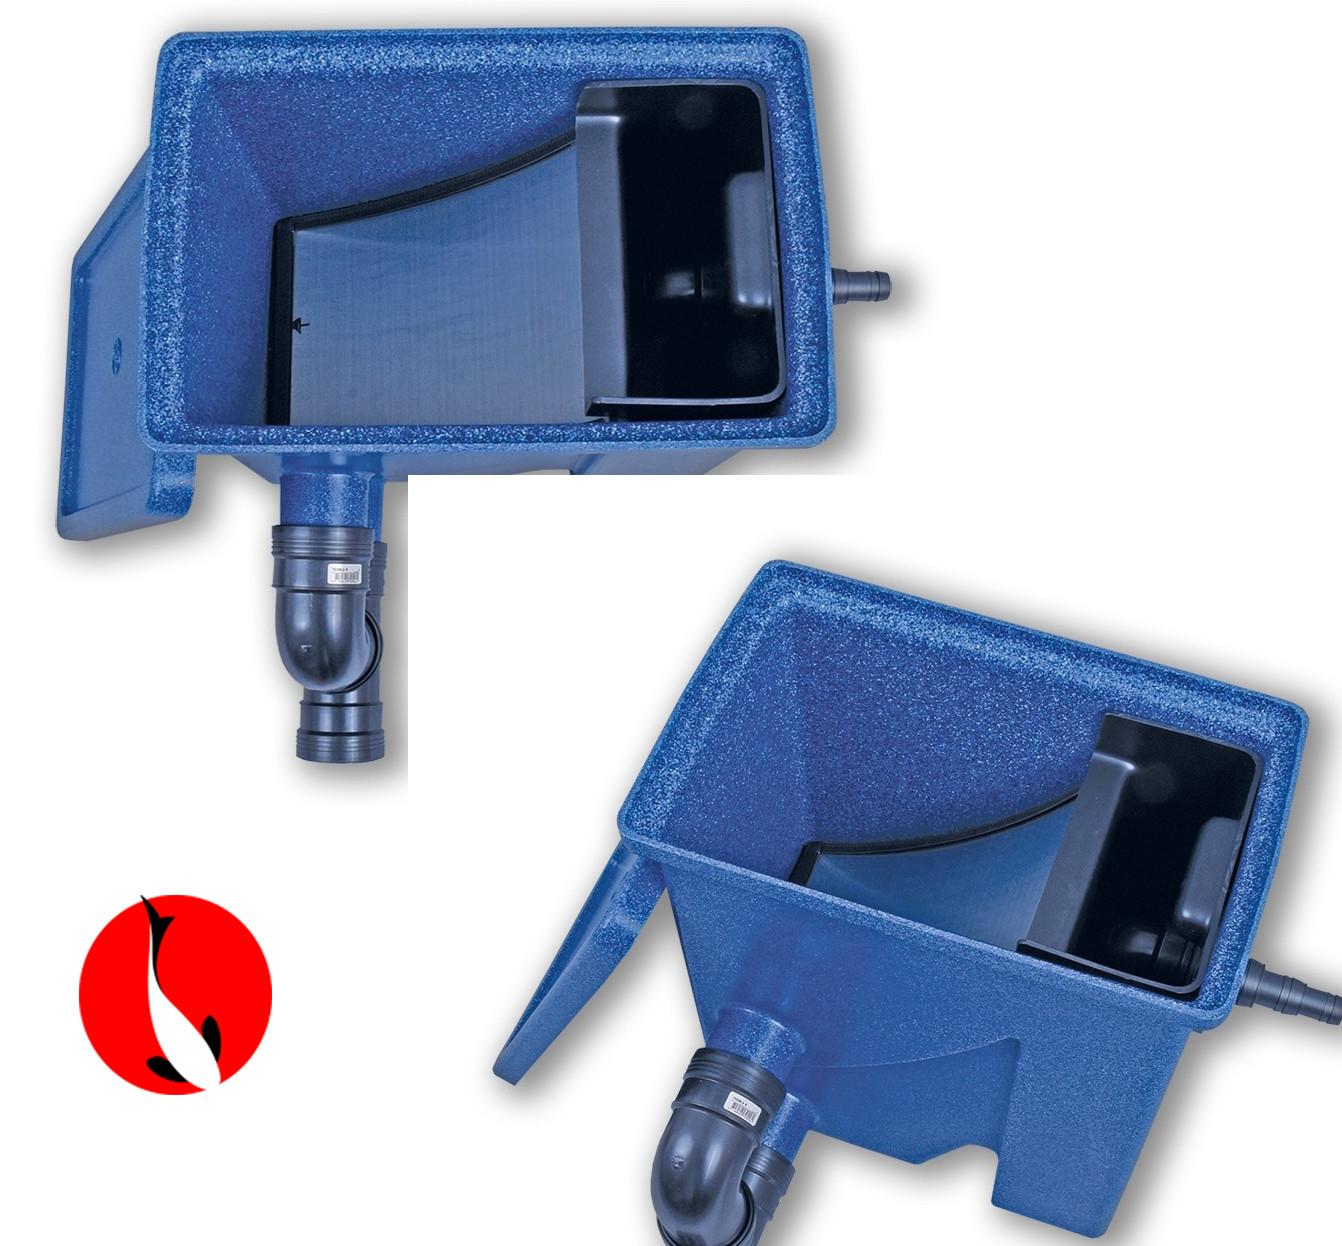 AquaForte Compact Sieve